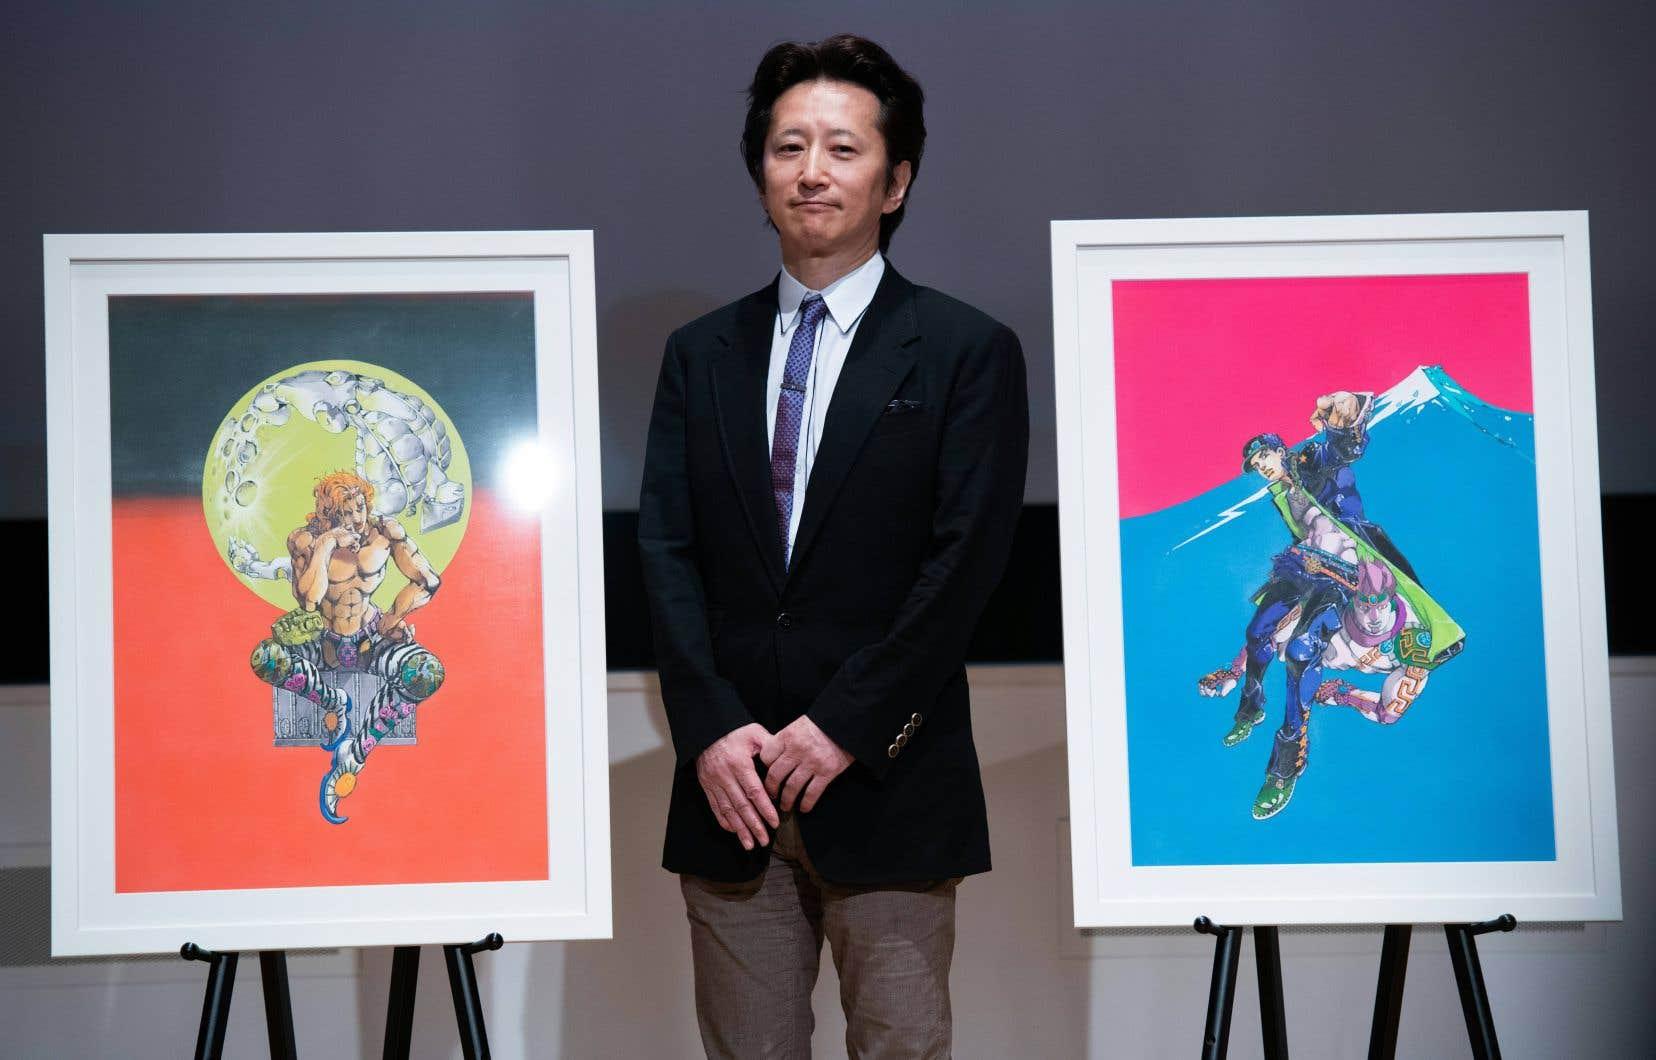 Pendant plus d'un mois, Hirohiko Araki, dessinateur de manga connu pour sa gigantesque saga Jojo, sera exposé au Centre national des arts de Tokyo.